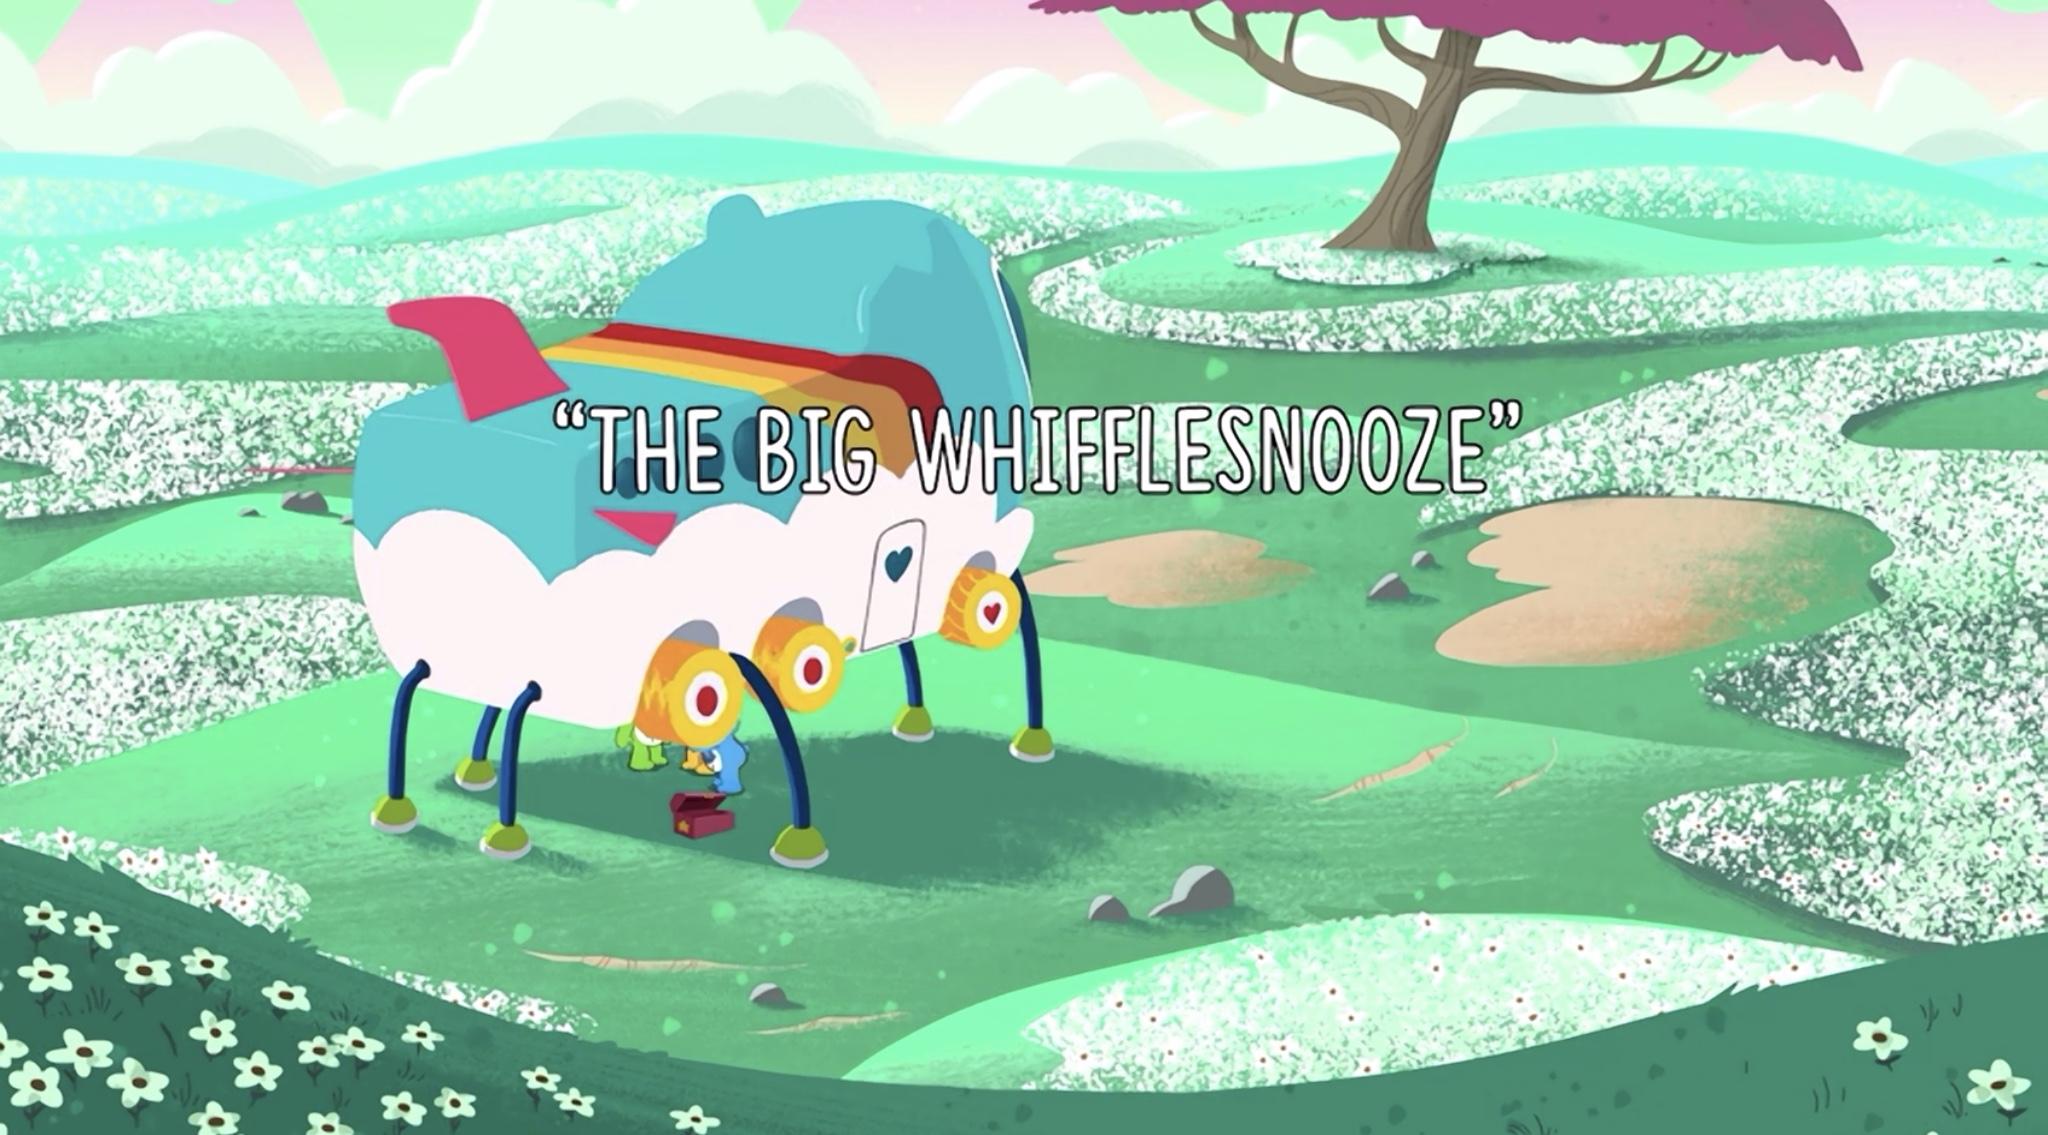 The Big Whifflesnooze